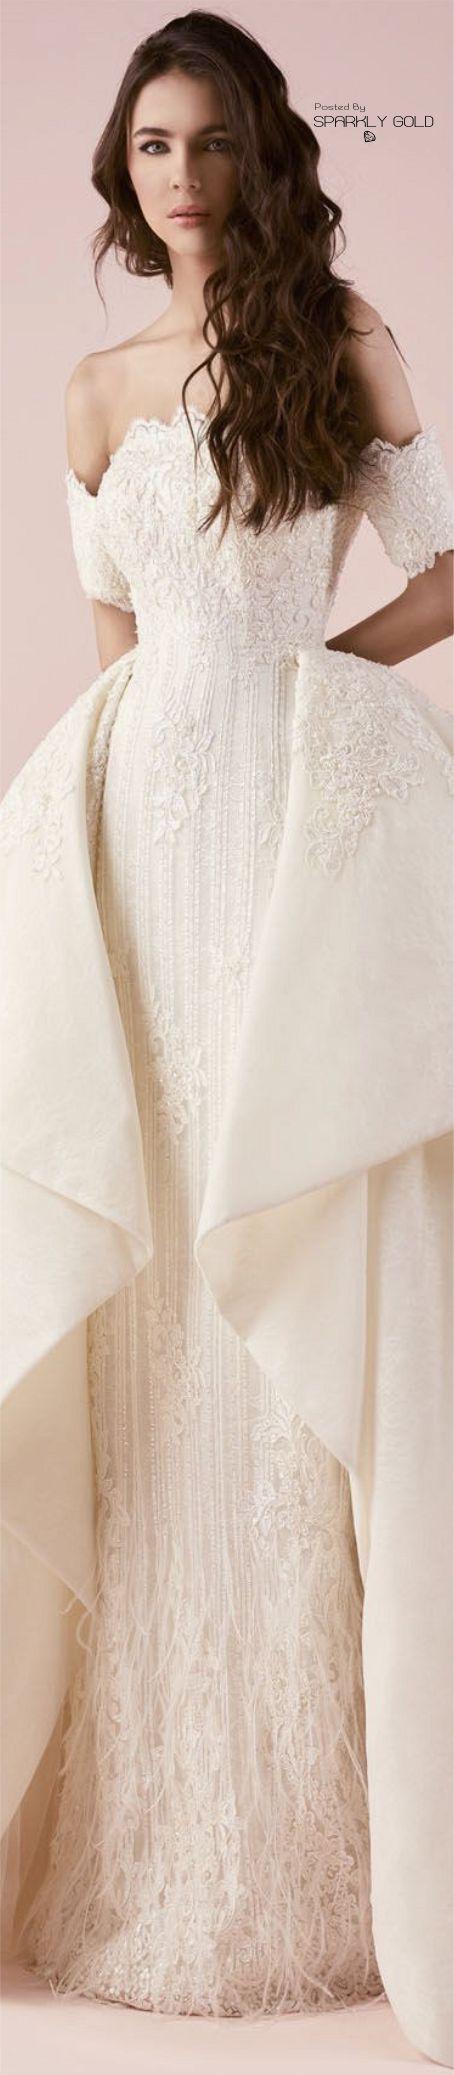 Saiid kobeisy spring bridal couture bridal pinterest